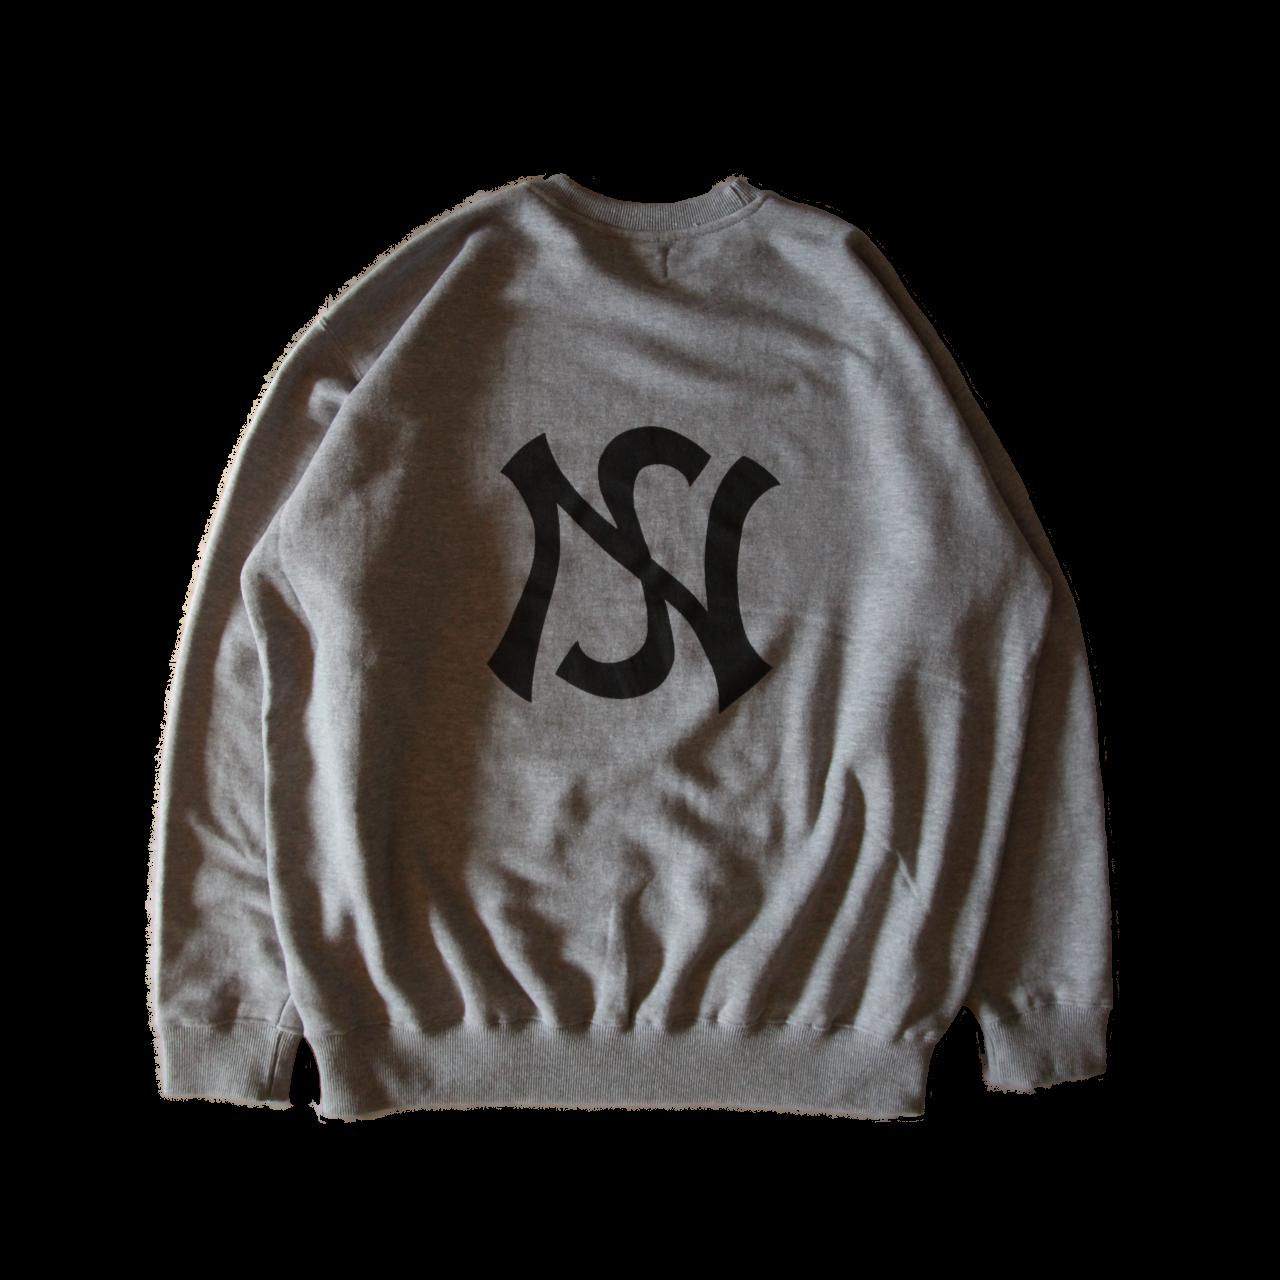 signature sweater in gray